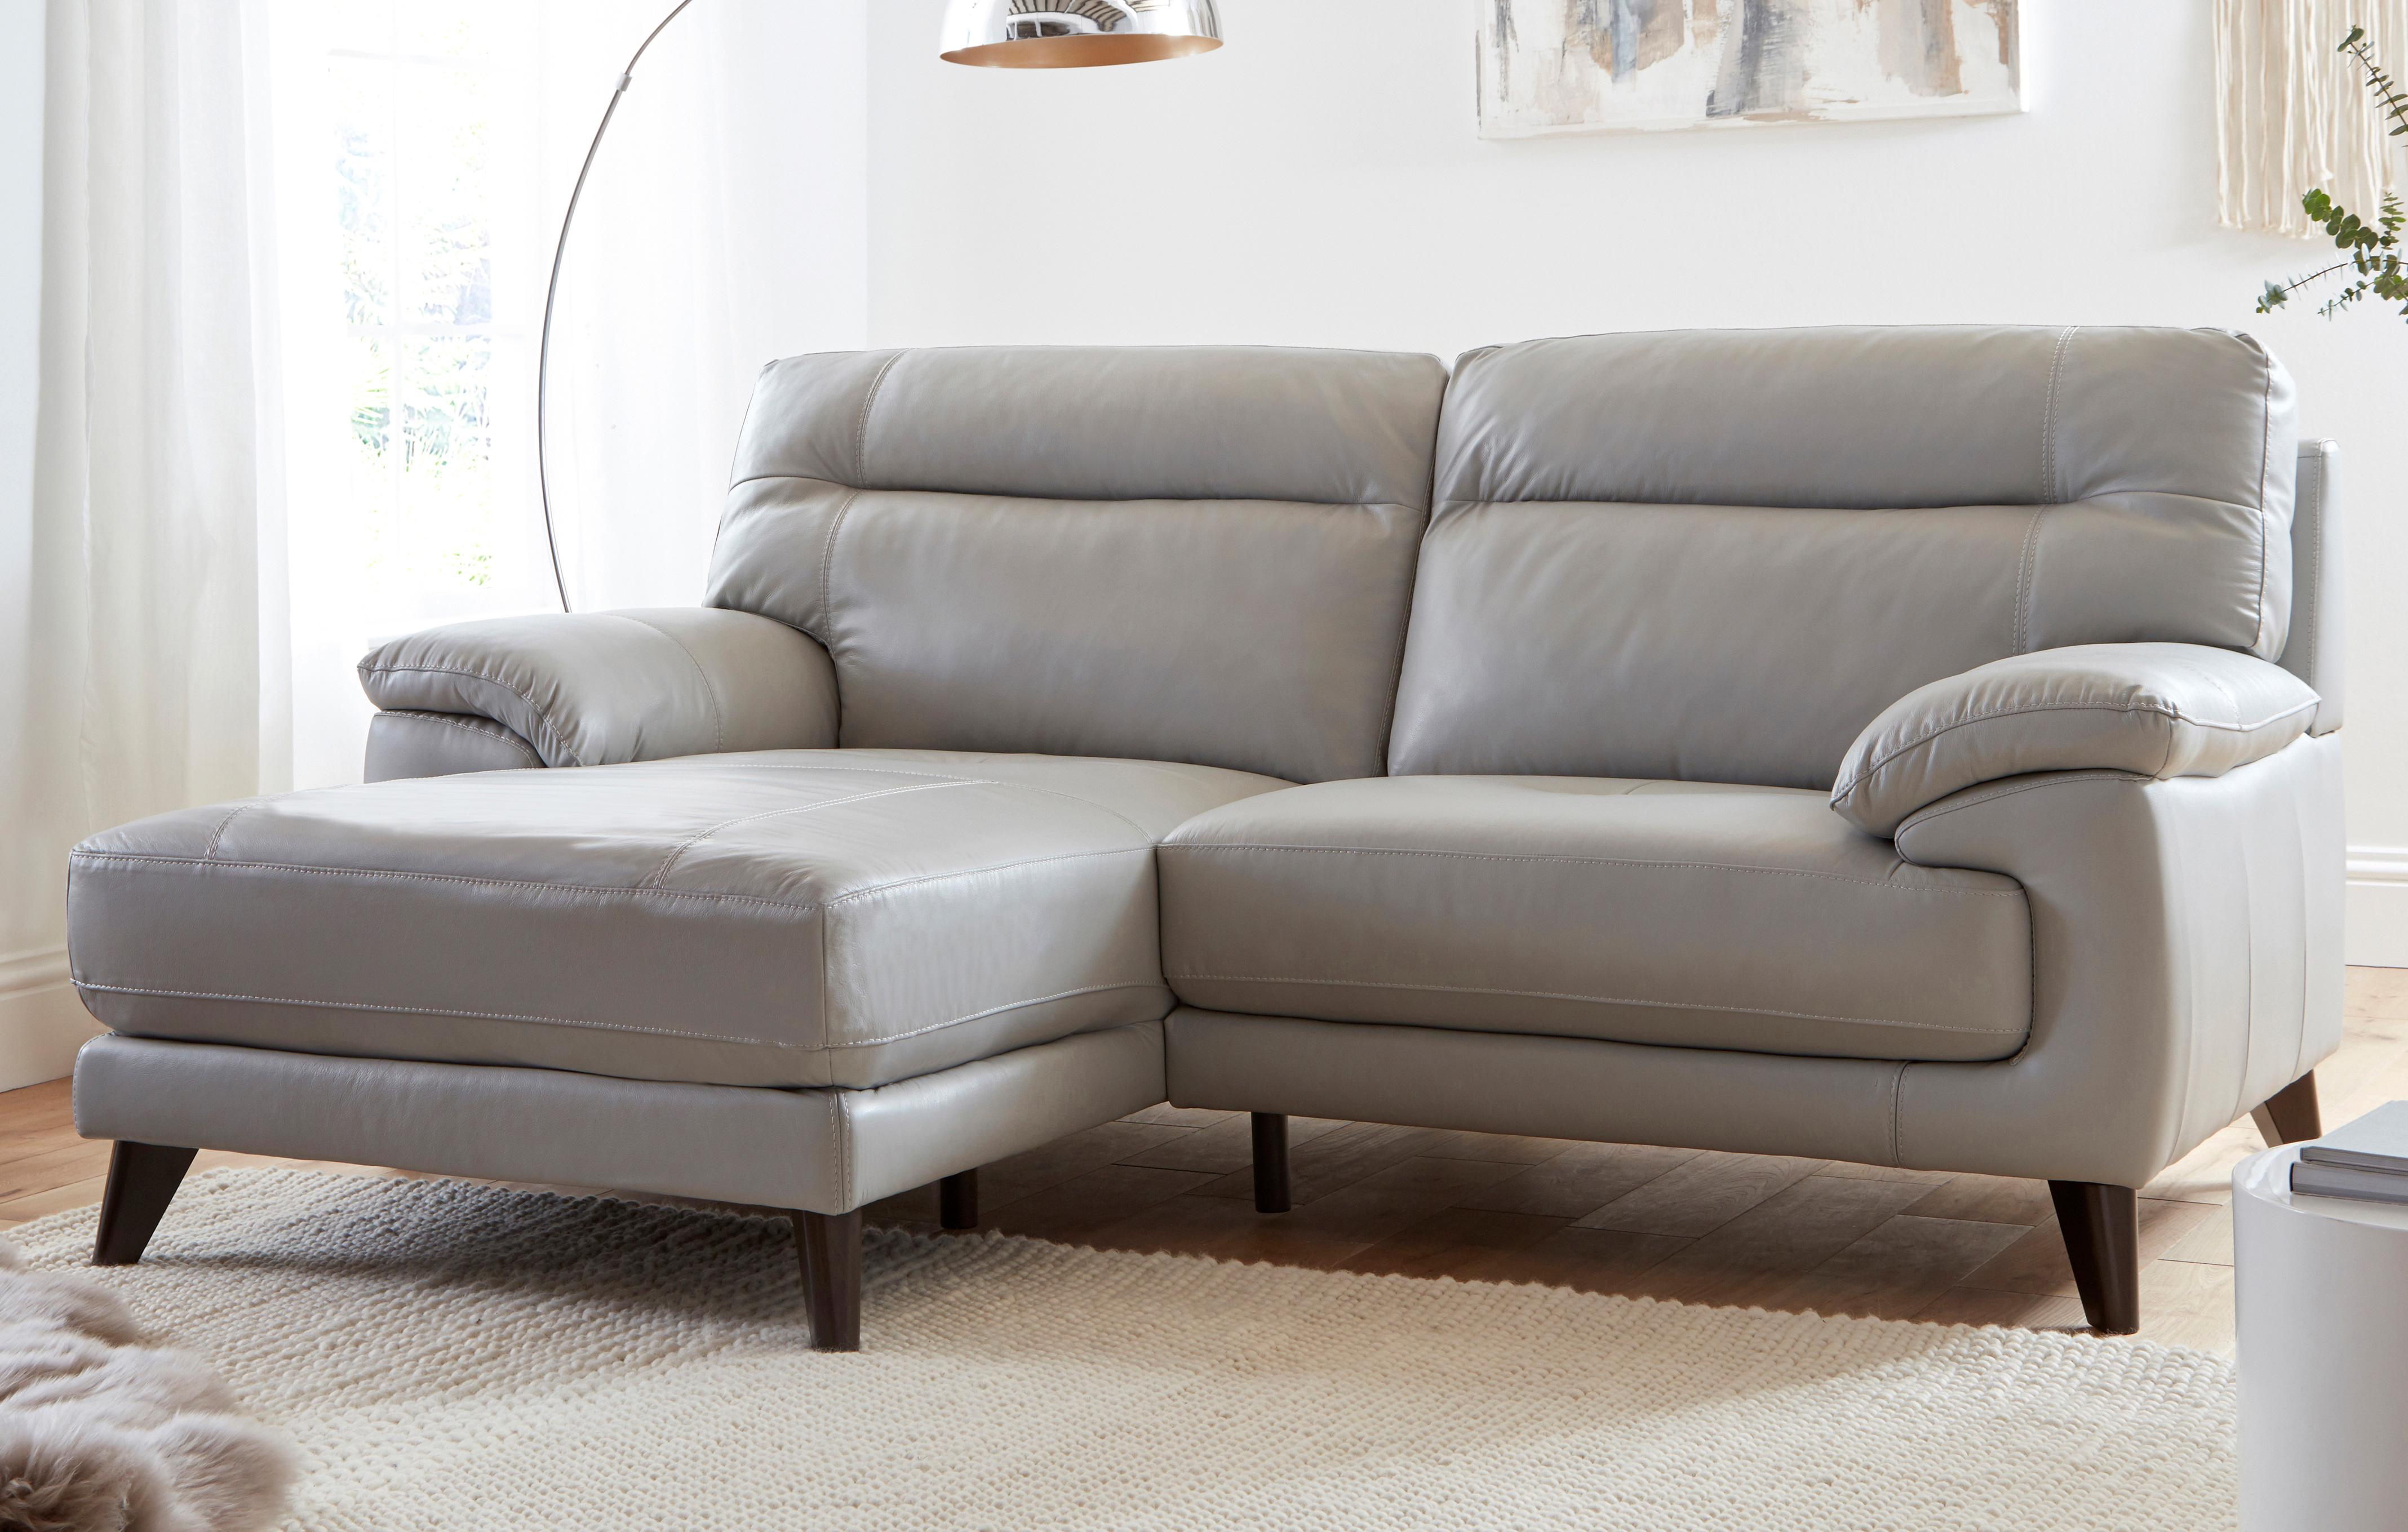 Leather Corner Sofas In A Range Of Styles Ireland | DFS Ireland